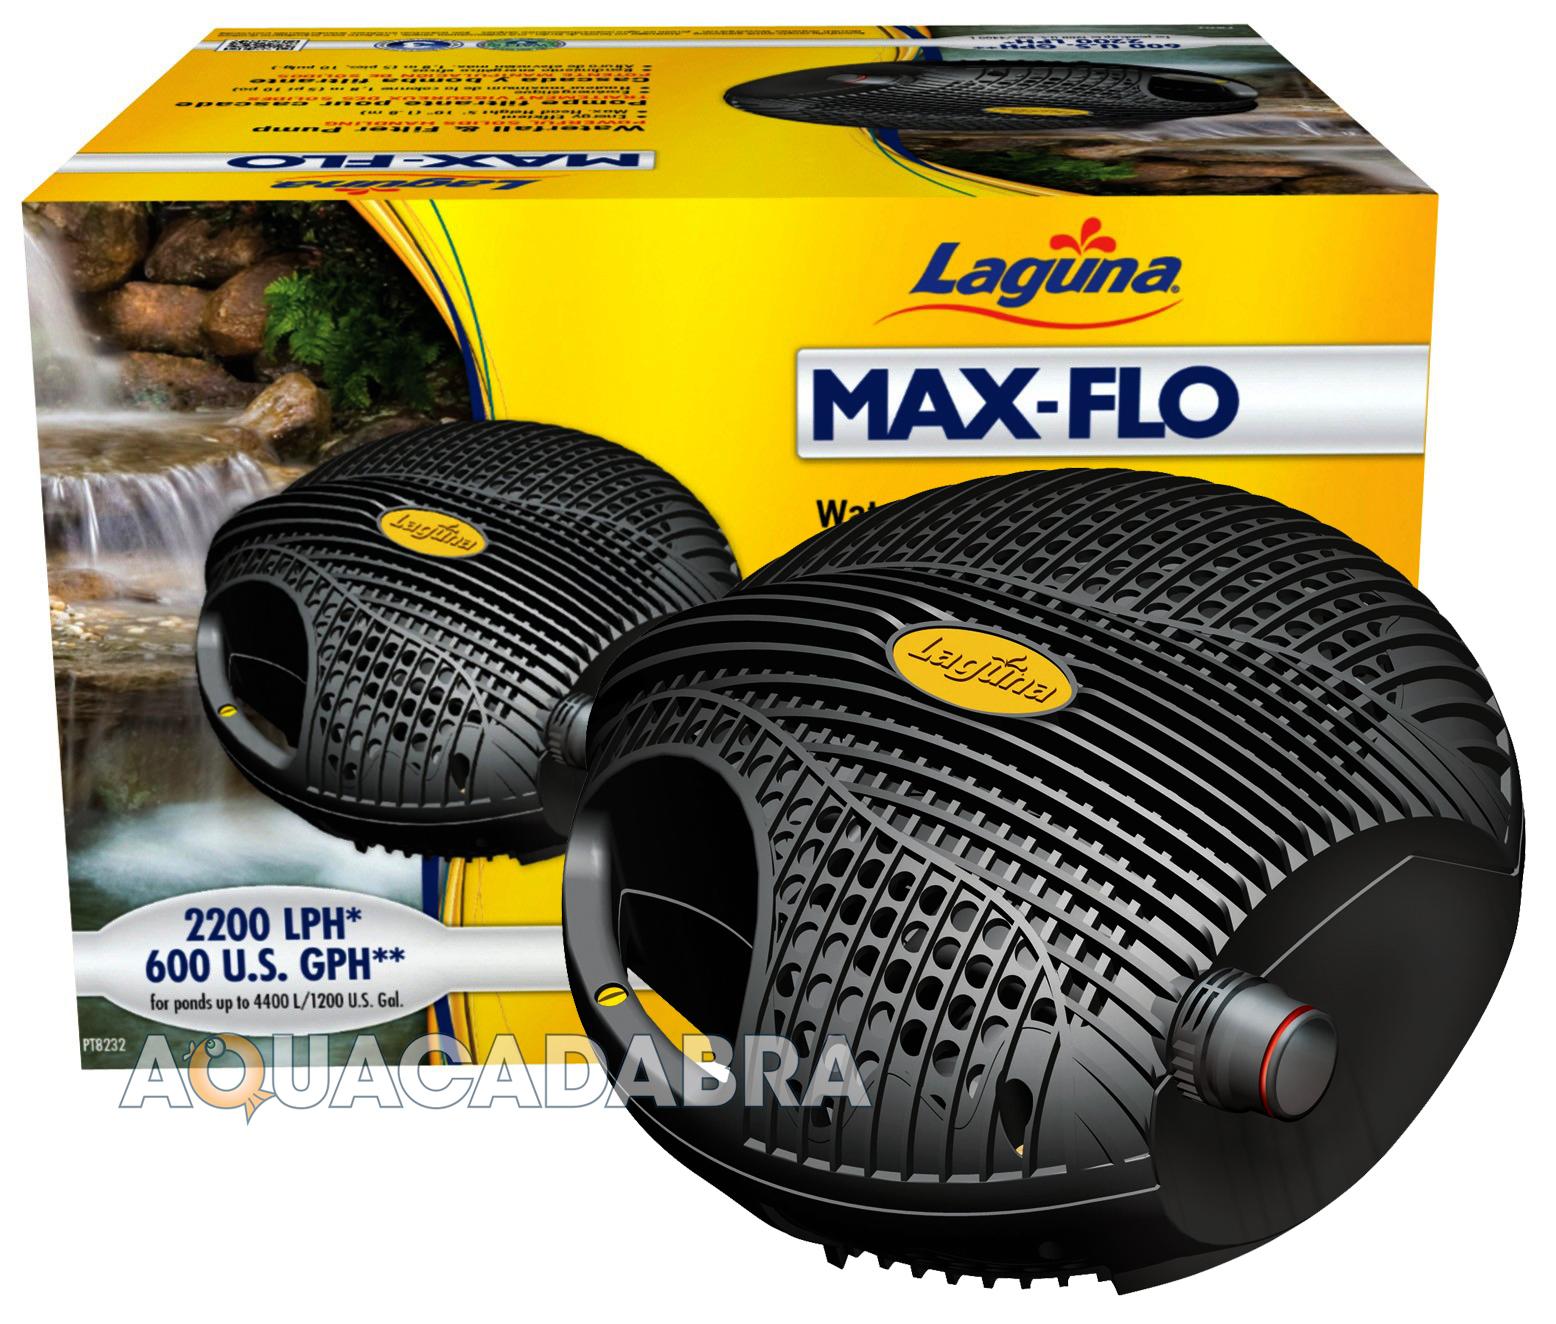 Laguna Maxflo Waterfall Filter Pond Pump Handles Solids Ebay